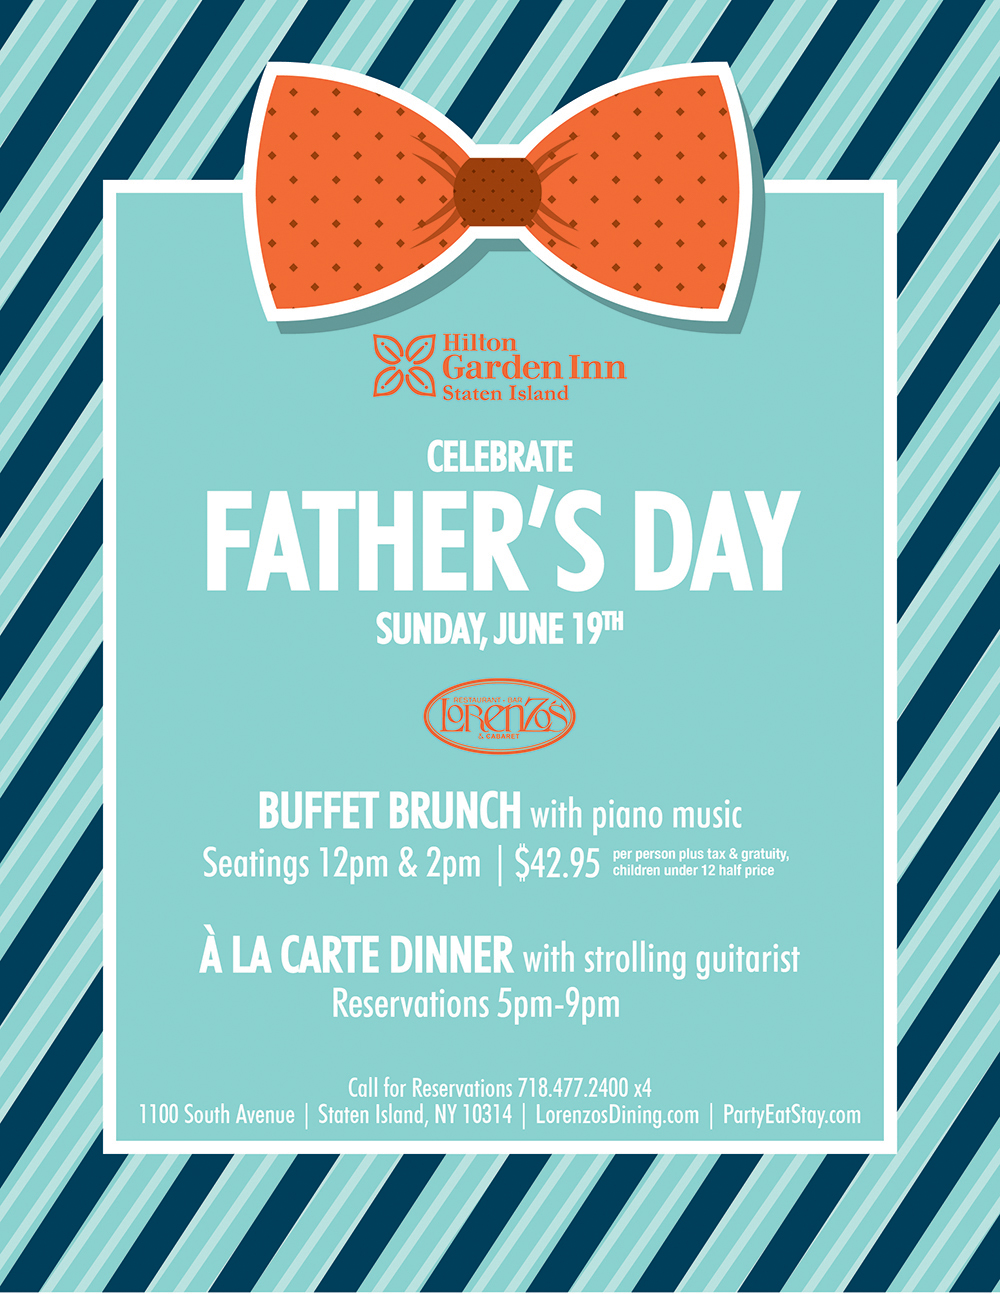 Hilton Garden inn Celebrate Father's Day June 19th